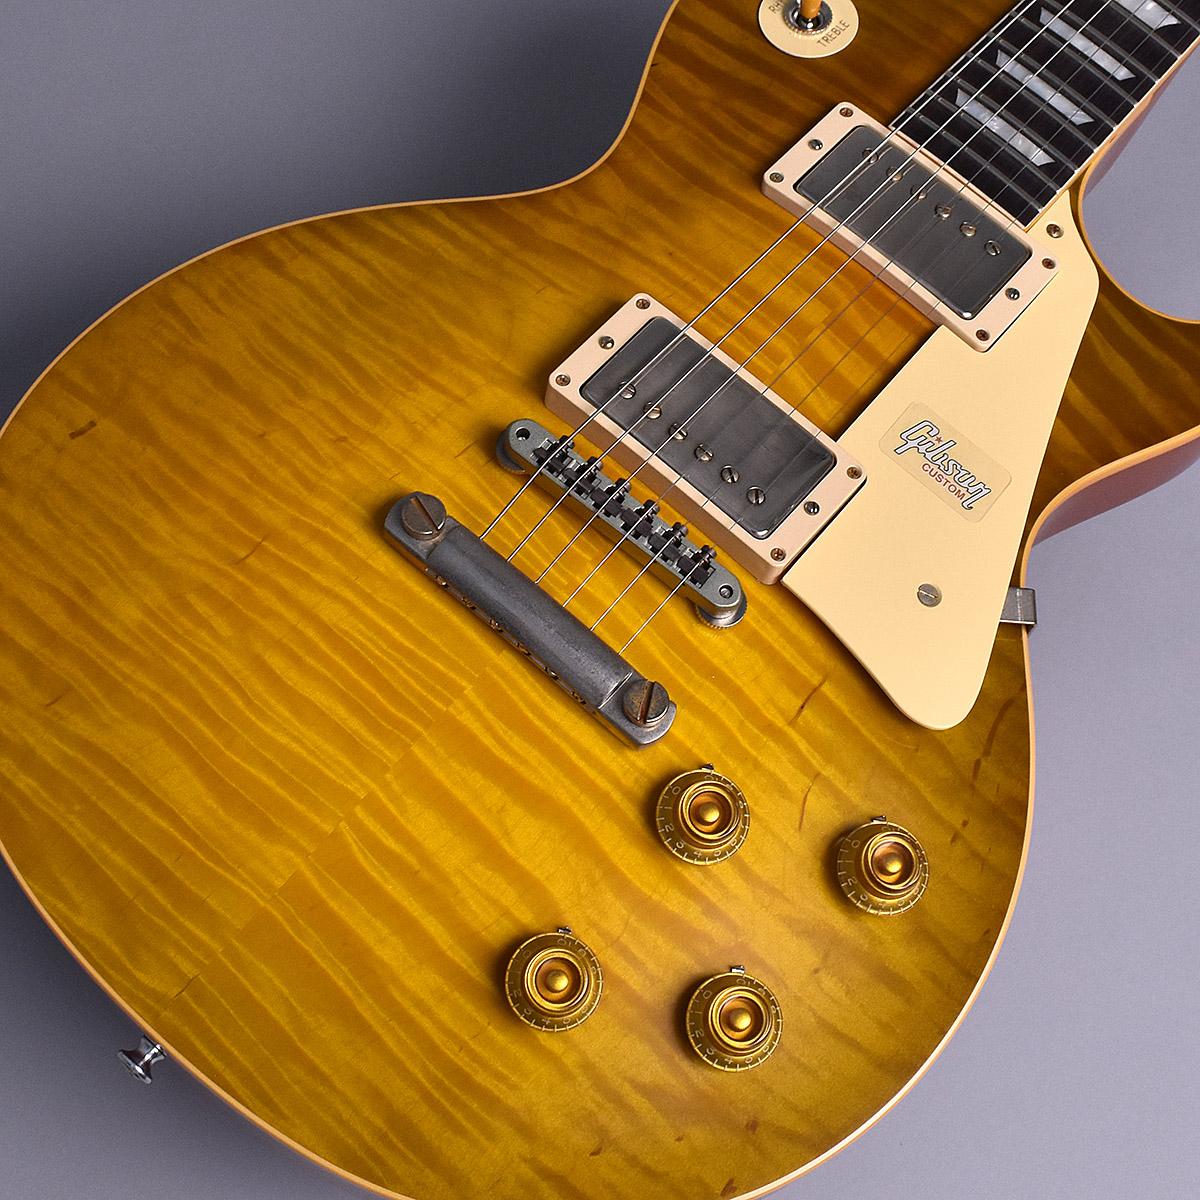 Gibson Custom Shop 1959 Les Paul Standard VOS M2M Green Lemon S/N:971711 現地選定材オーダー品 【ギブソン カスタムショップ】【未展示品】